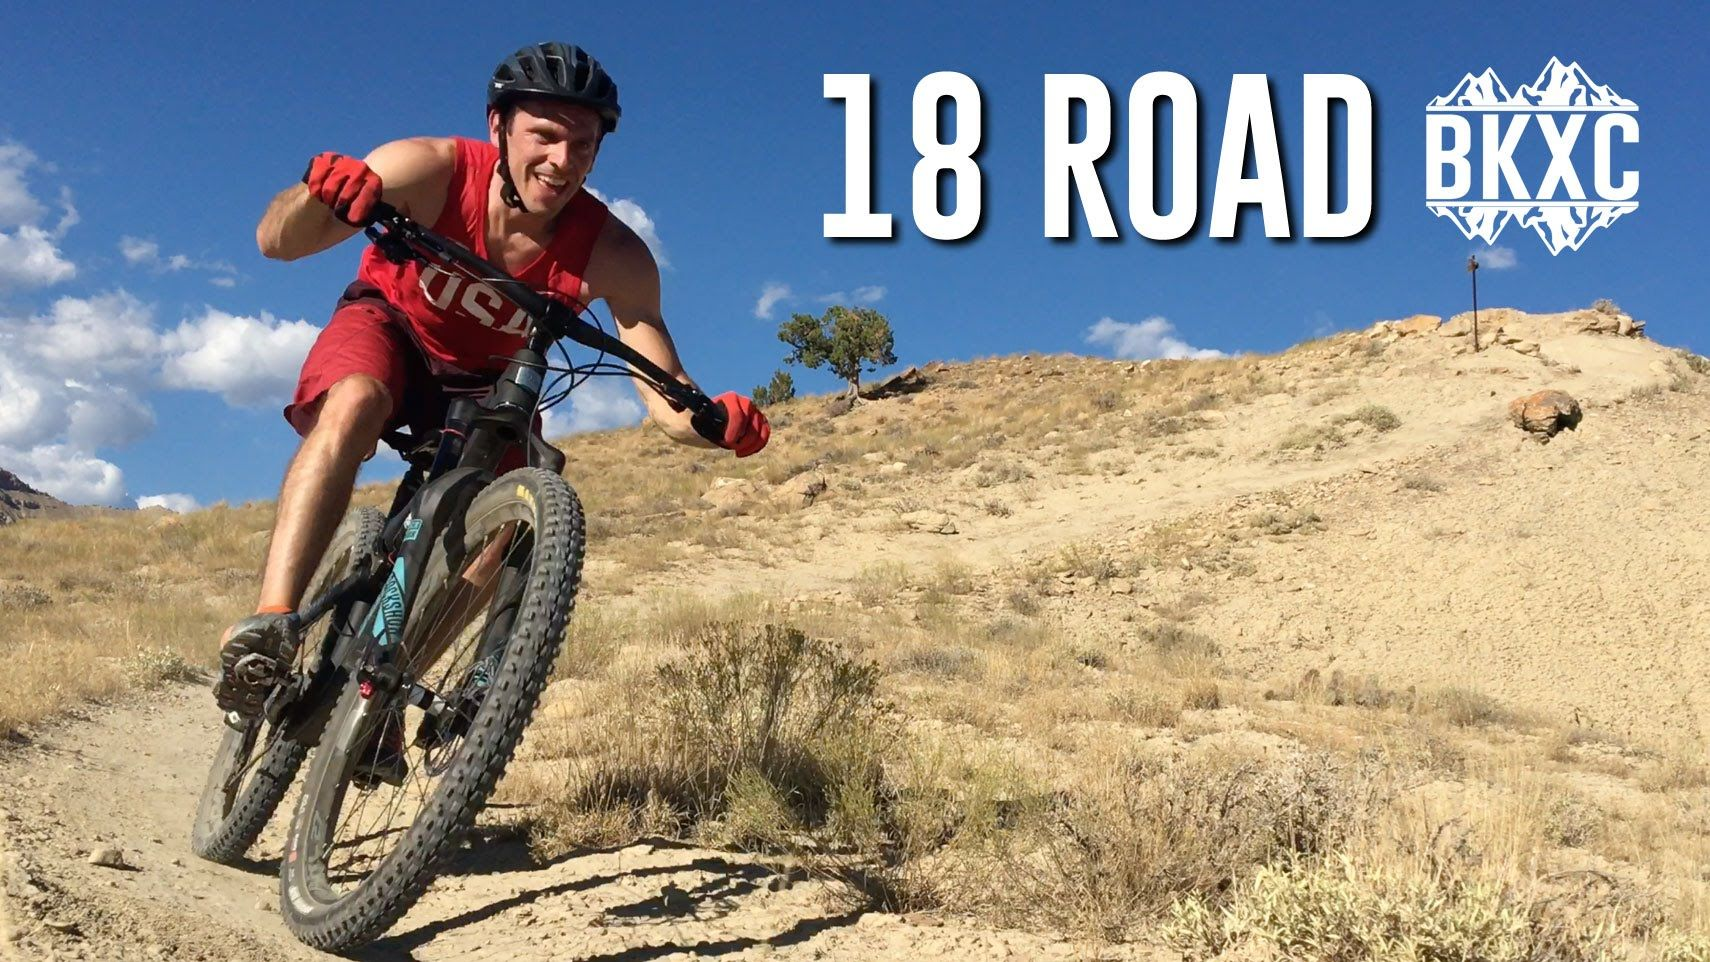 Mountain Biking The 18 Road Trails In Fruita Colorado Video Bike Trips Go Ride